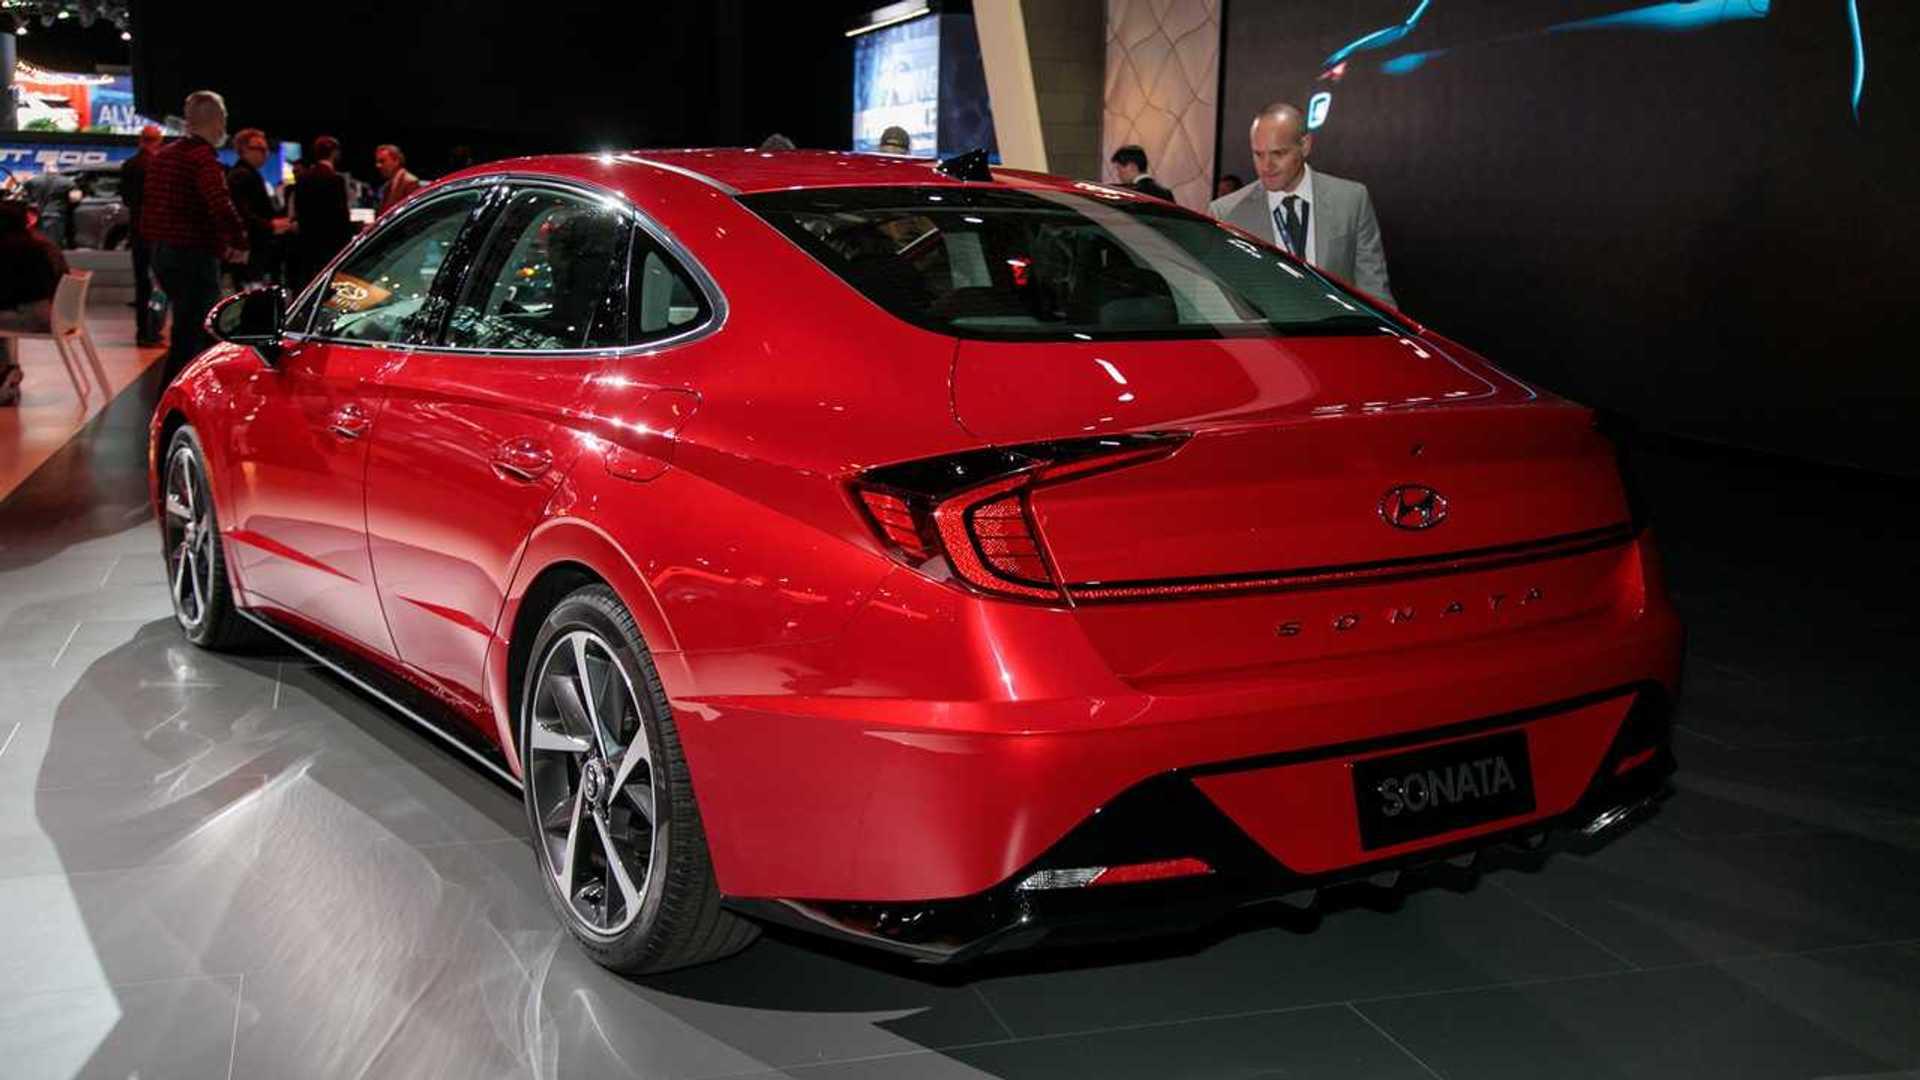 Here S Why The 2020 Hyundai Sonata Is The Most Striking Sedan